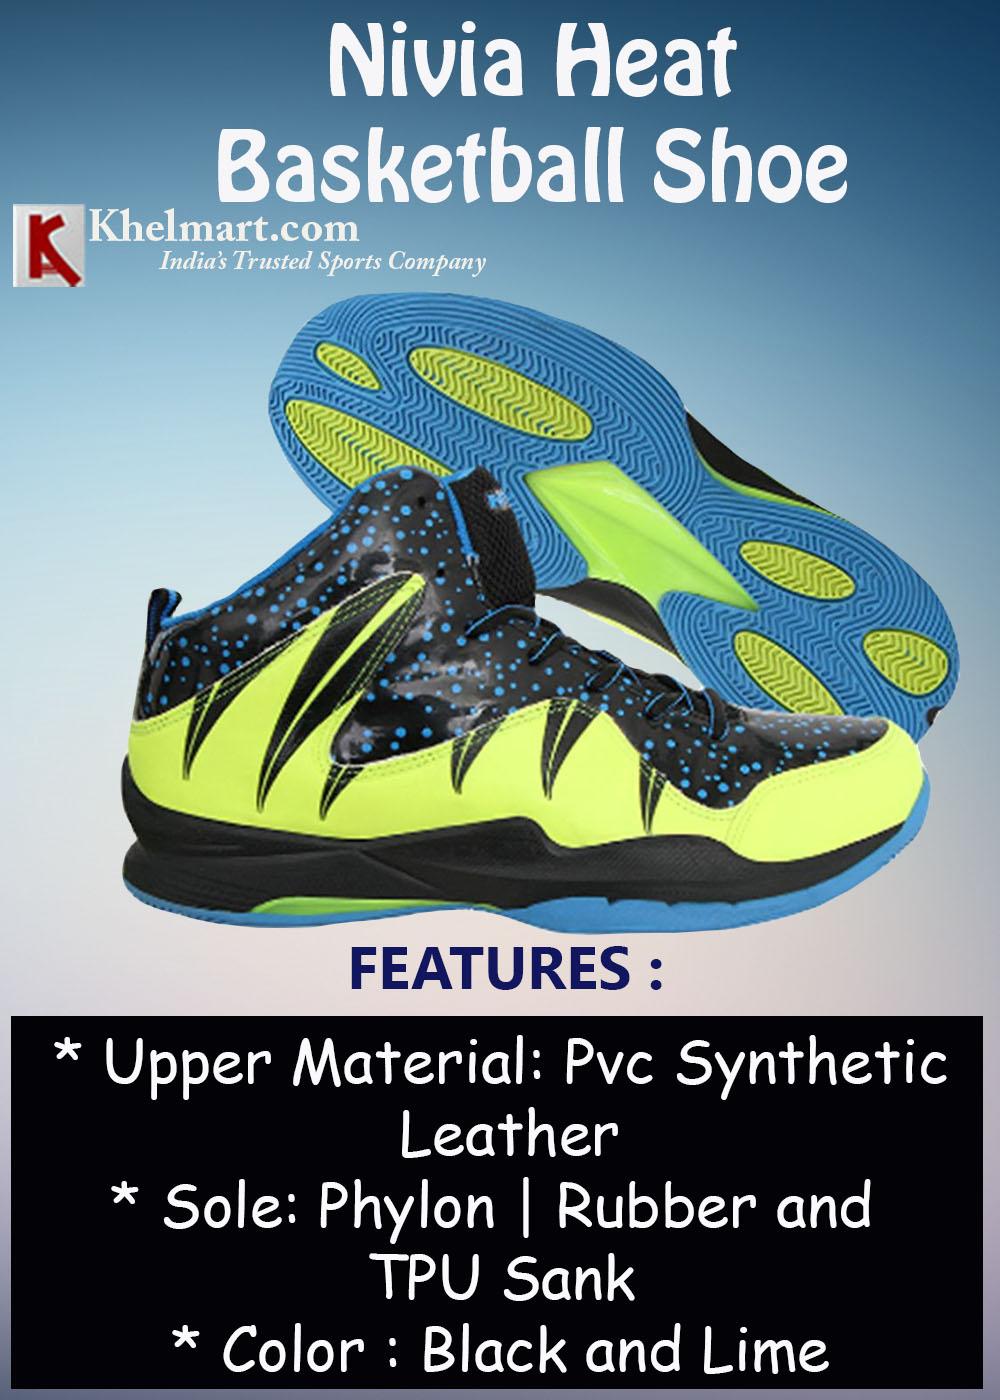 Nivia Heat Basketball Shoe Black and Lime